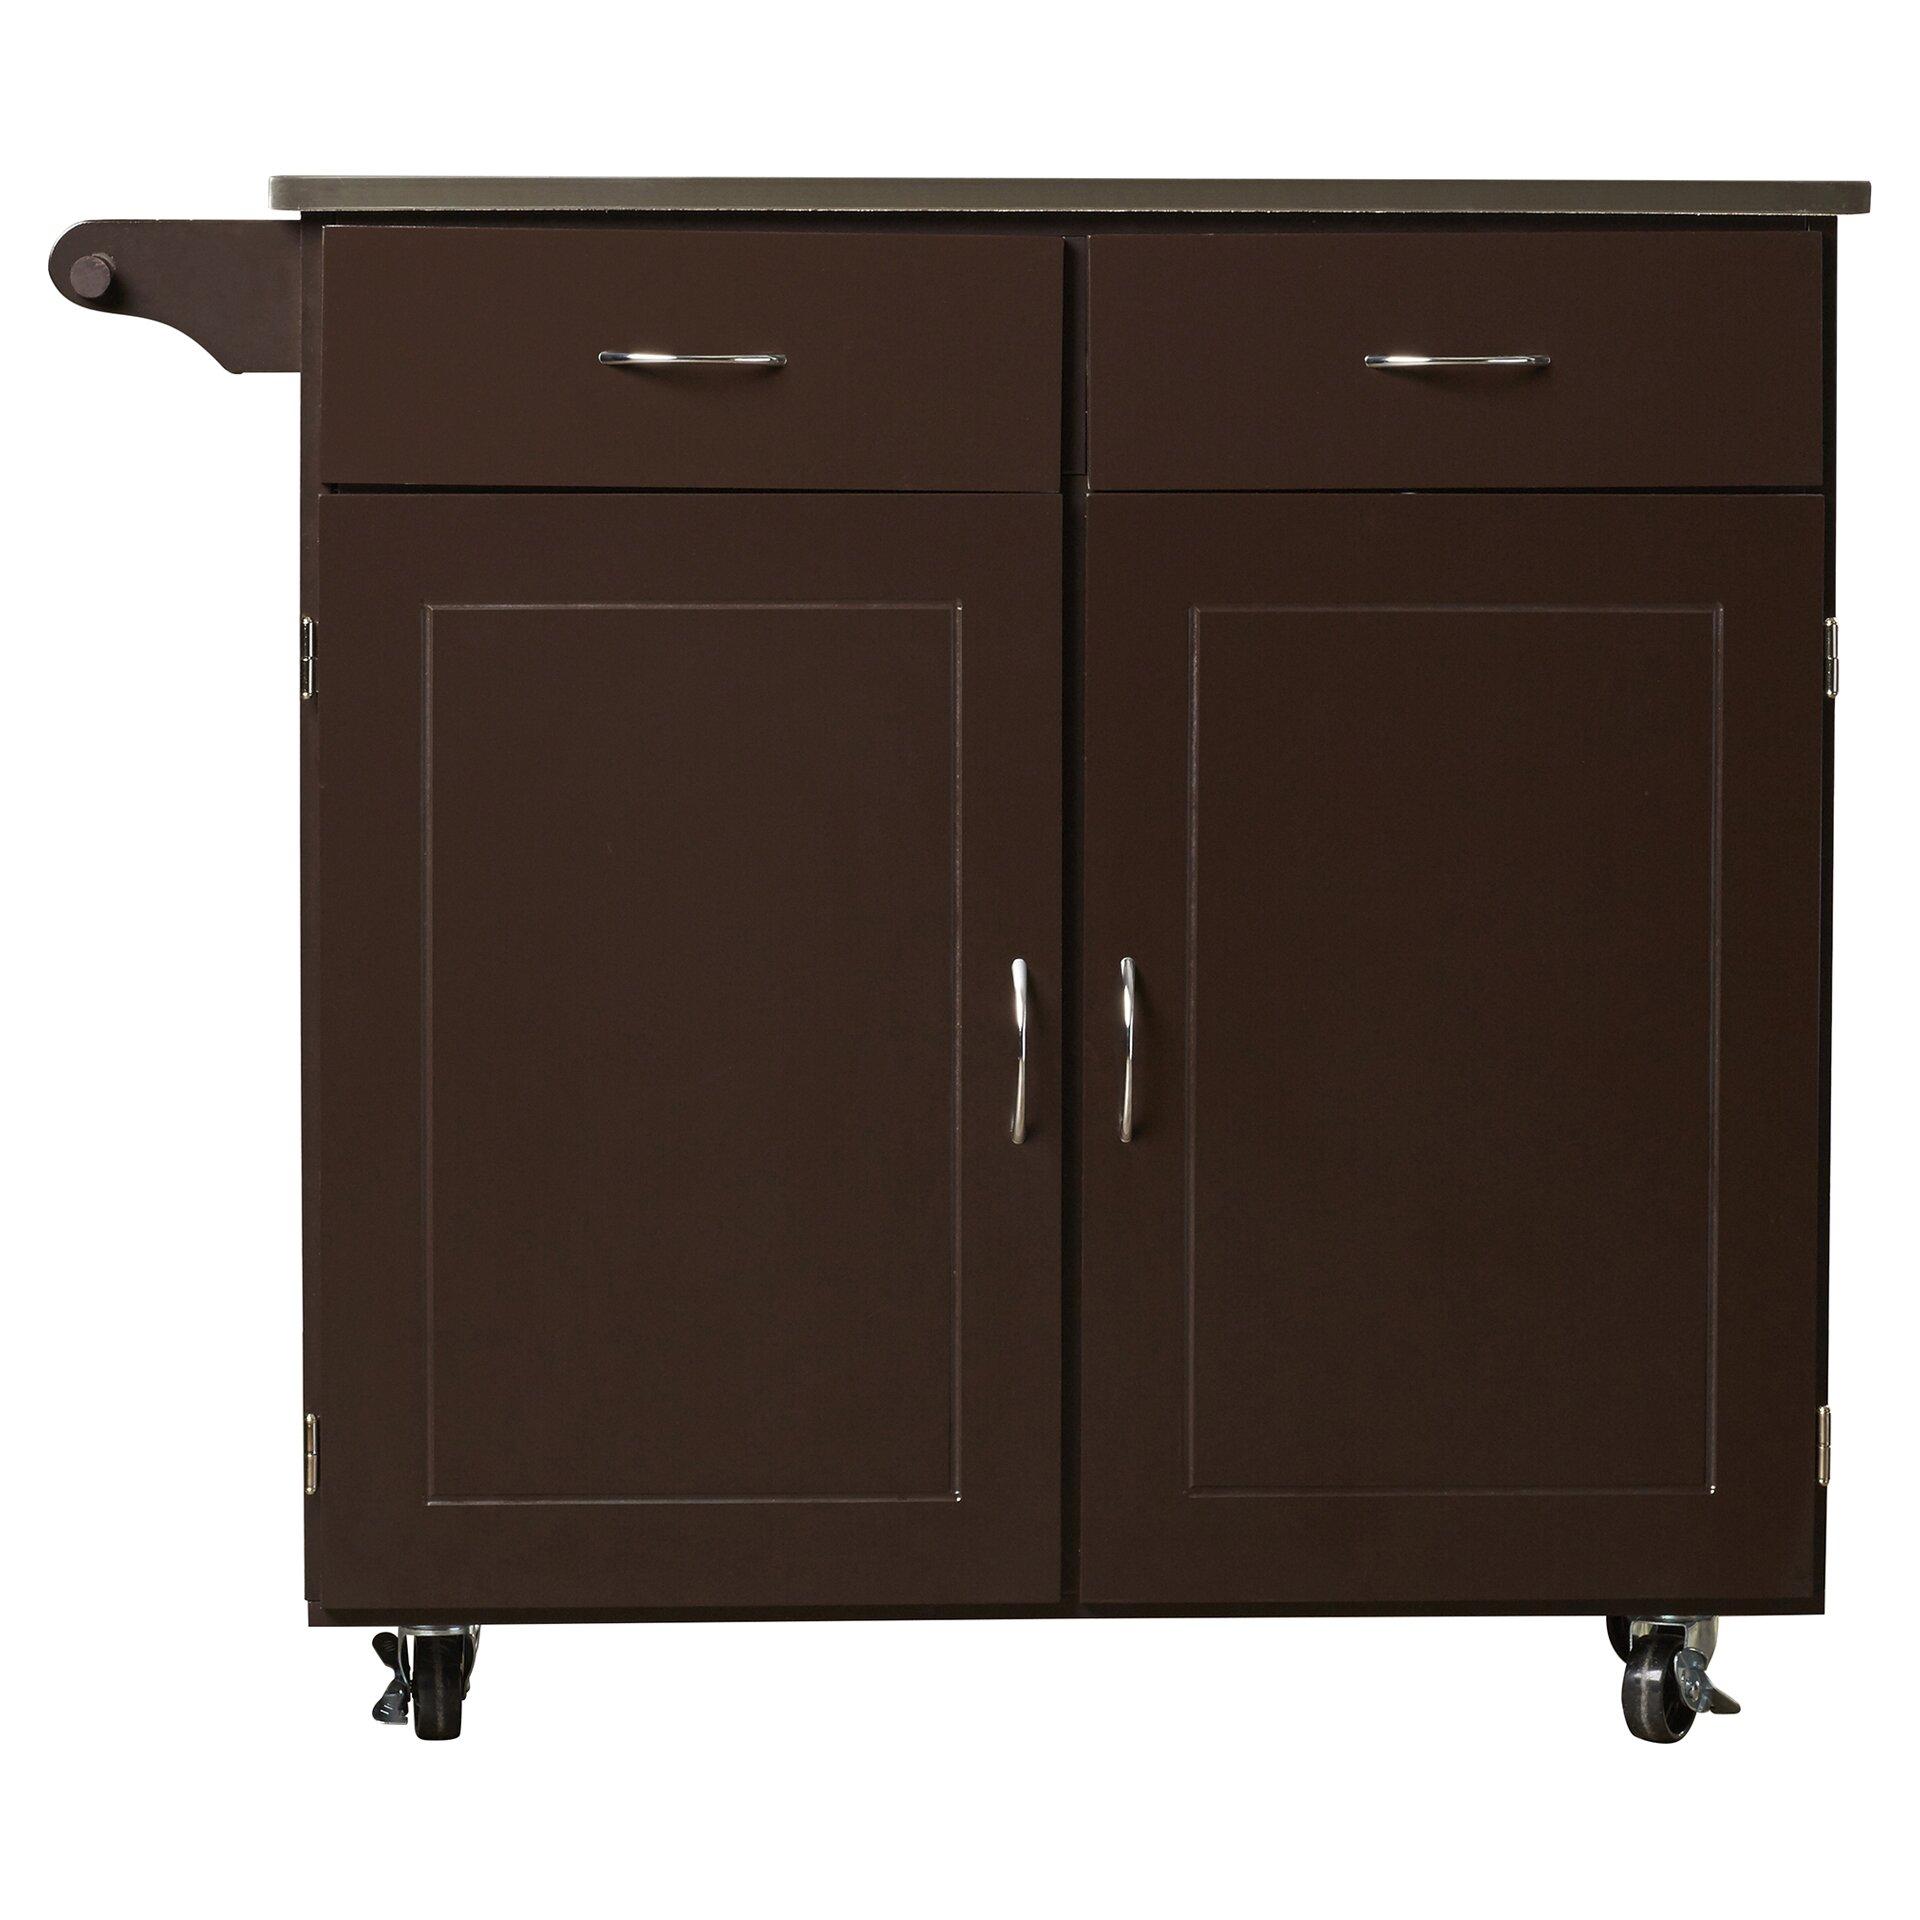 brayden studio dayville large kitchen cart with stainless